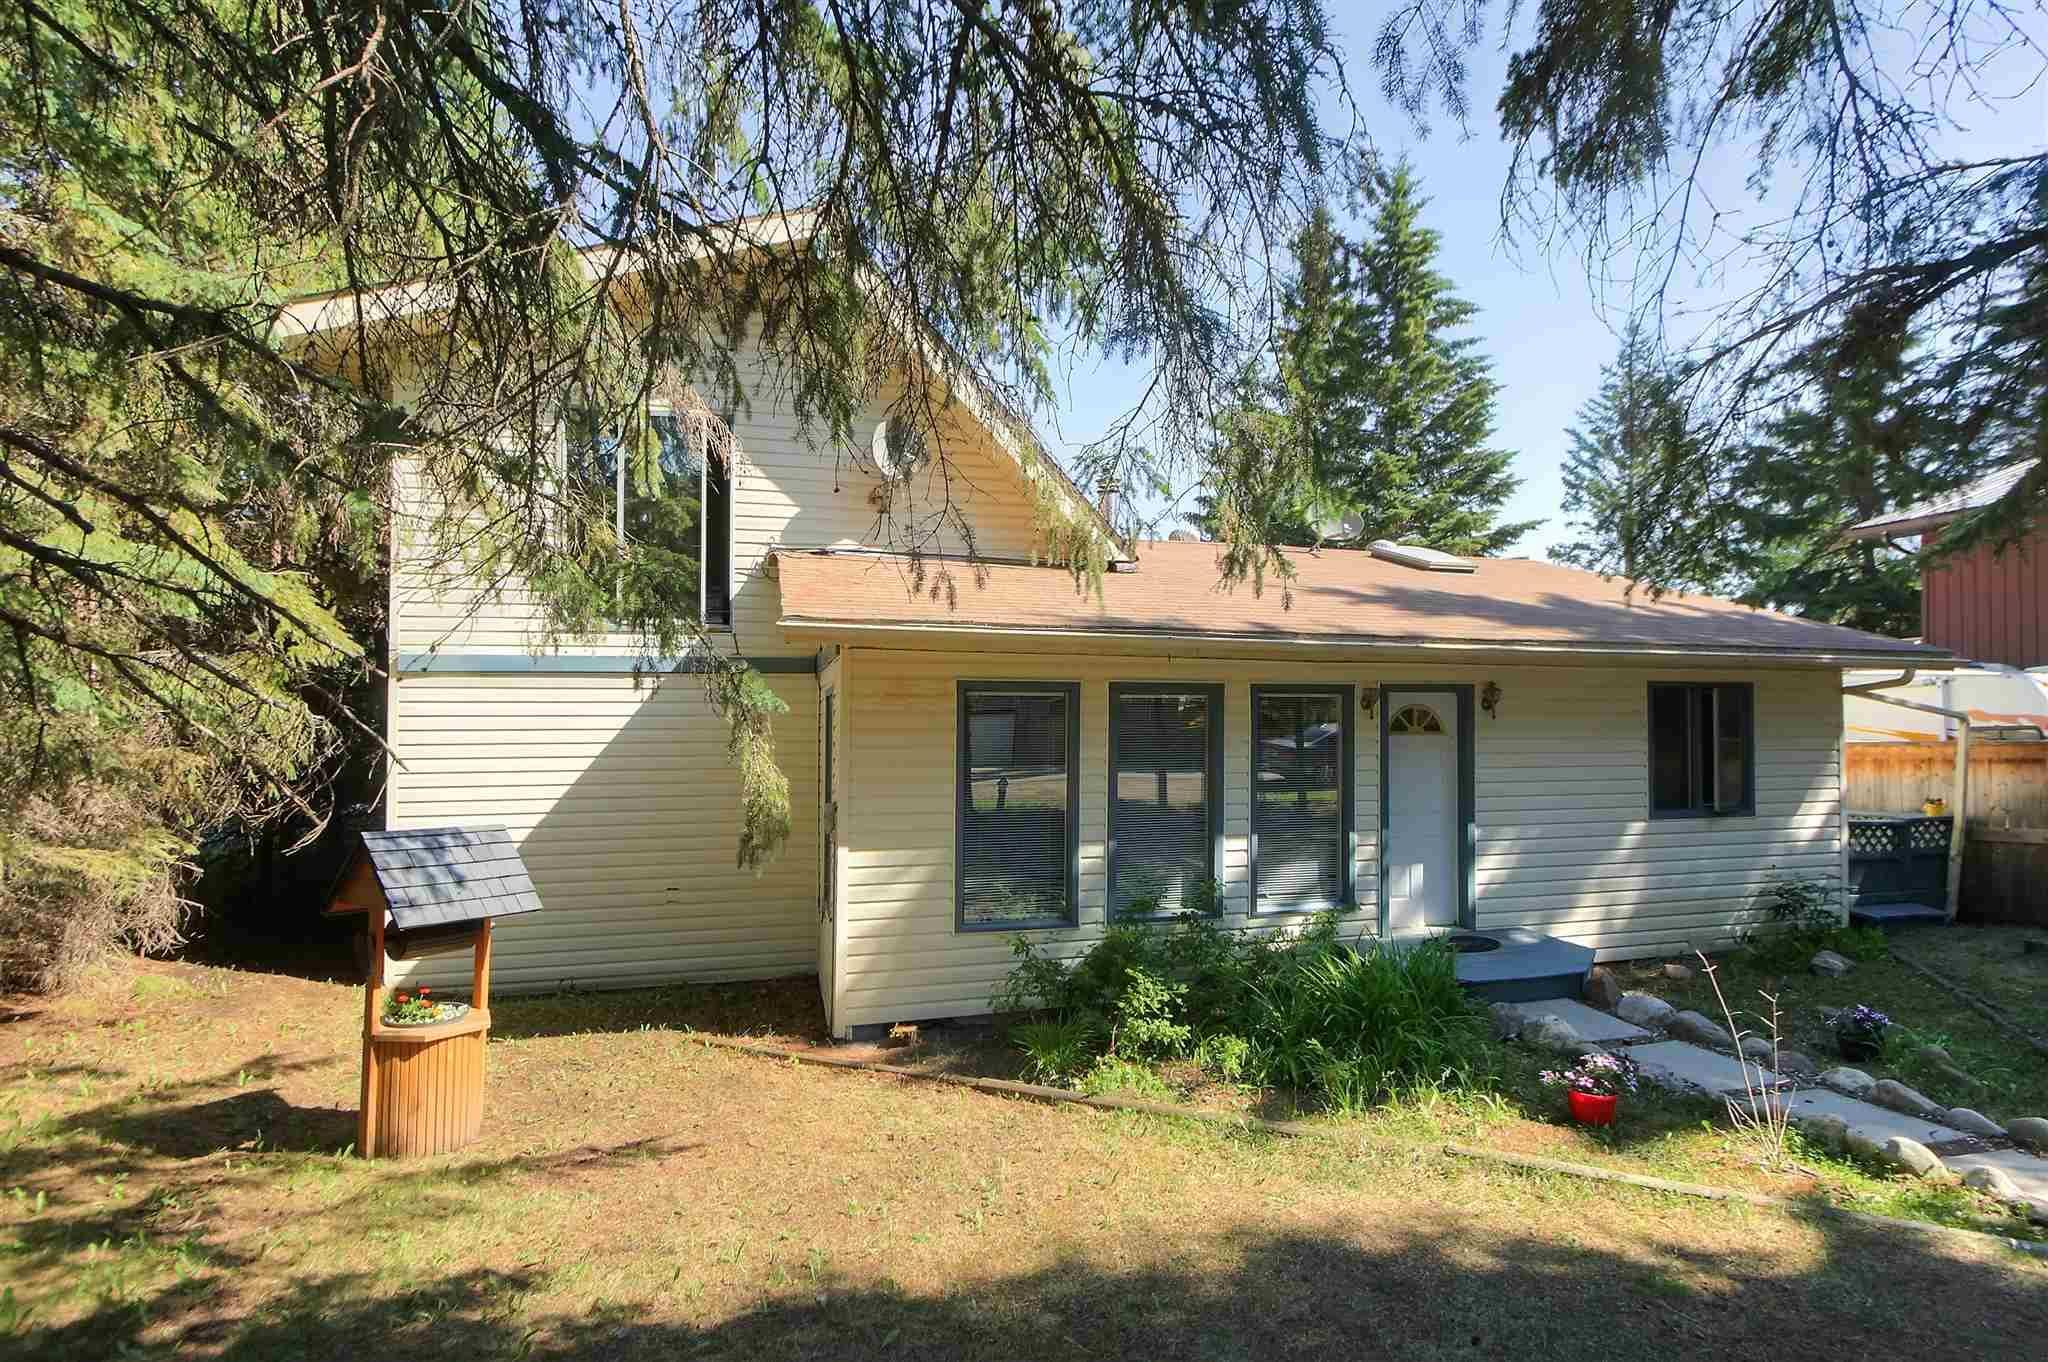 Main Photo: 1510 Marine Crescent: Rural Lac Ste. Anne County House for sale : MLS®# E4252229